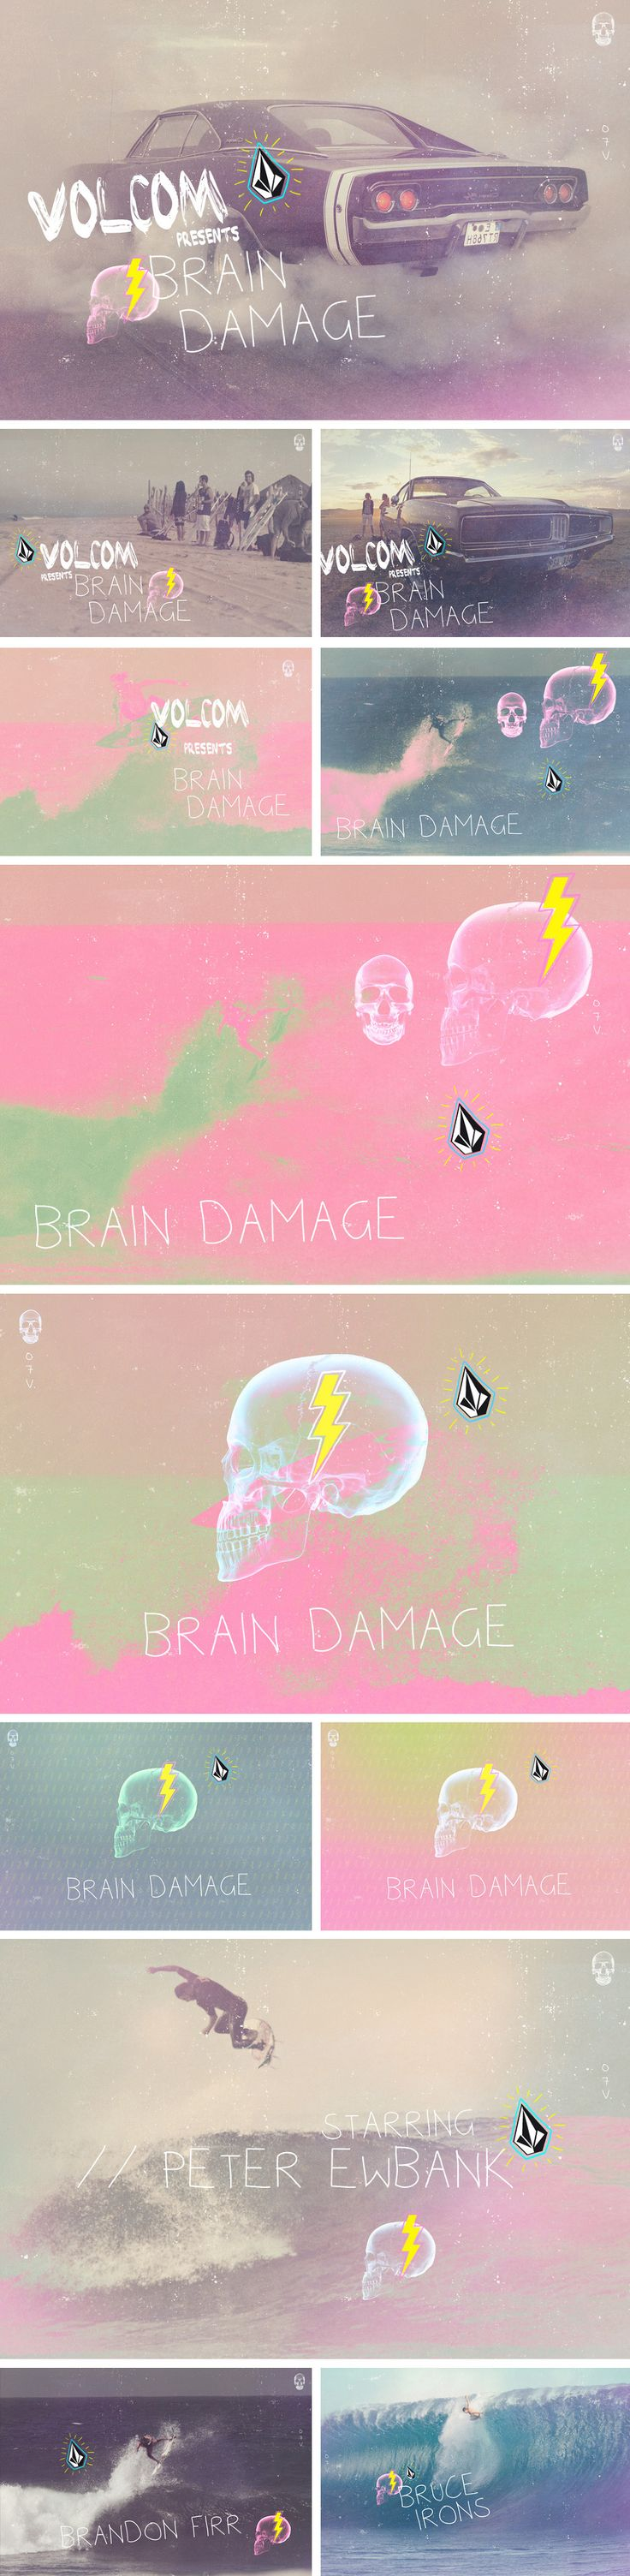 Volcom - Brain Damage Key Visual pitch for Volcom's surf movie Brain Damage.